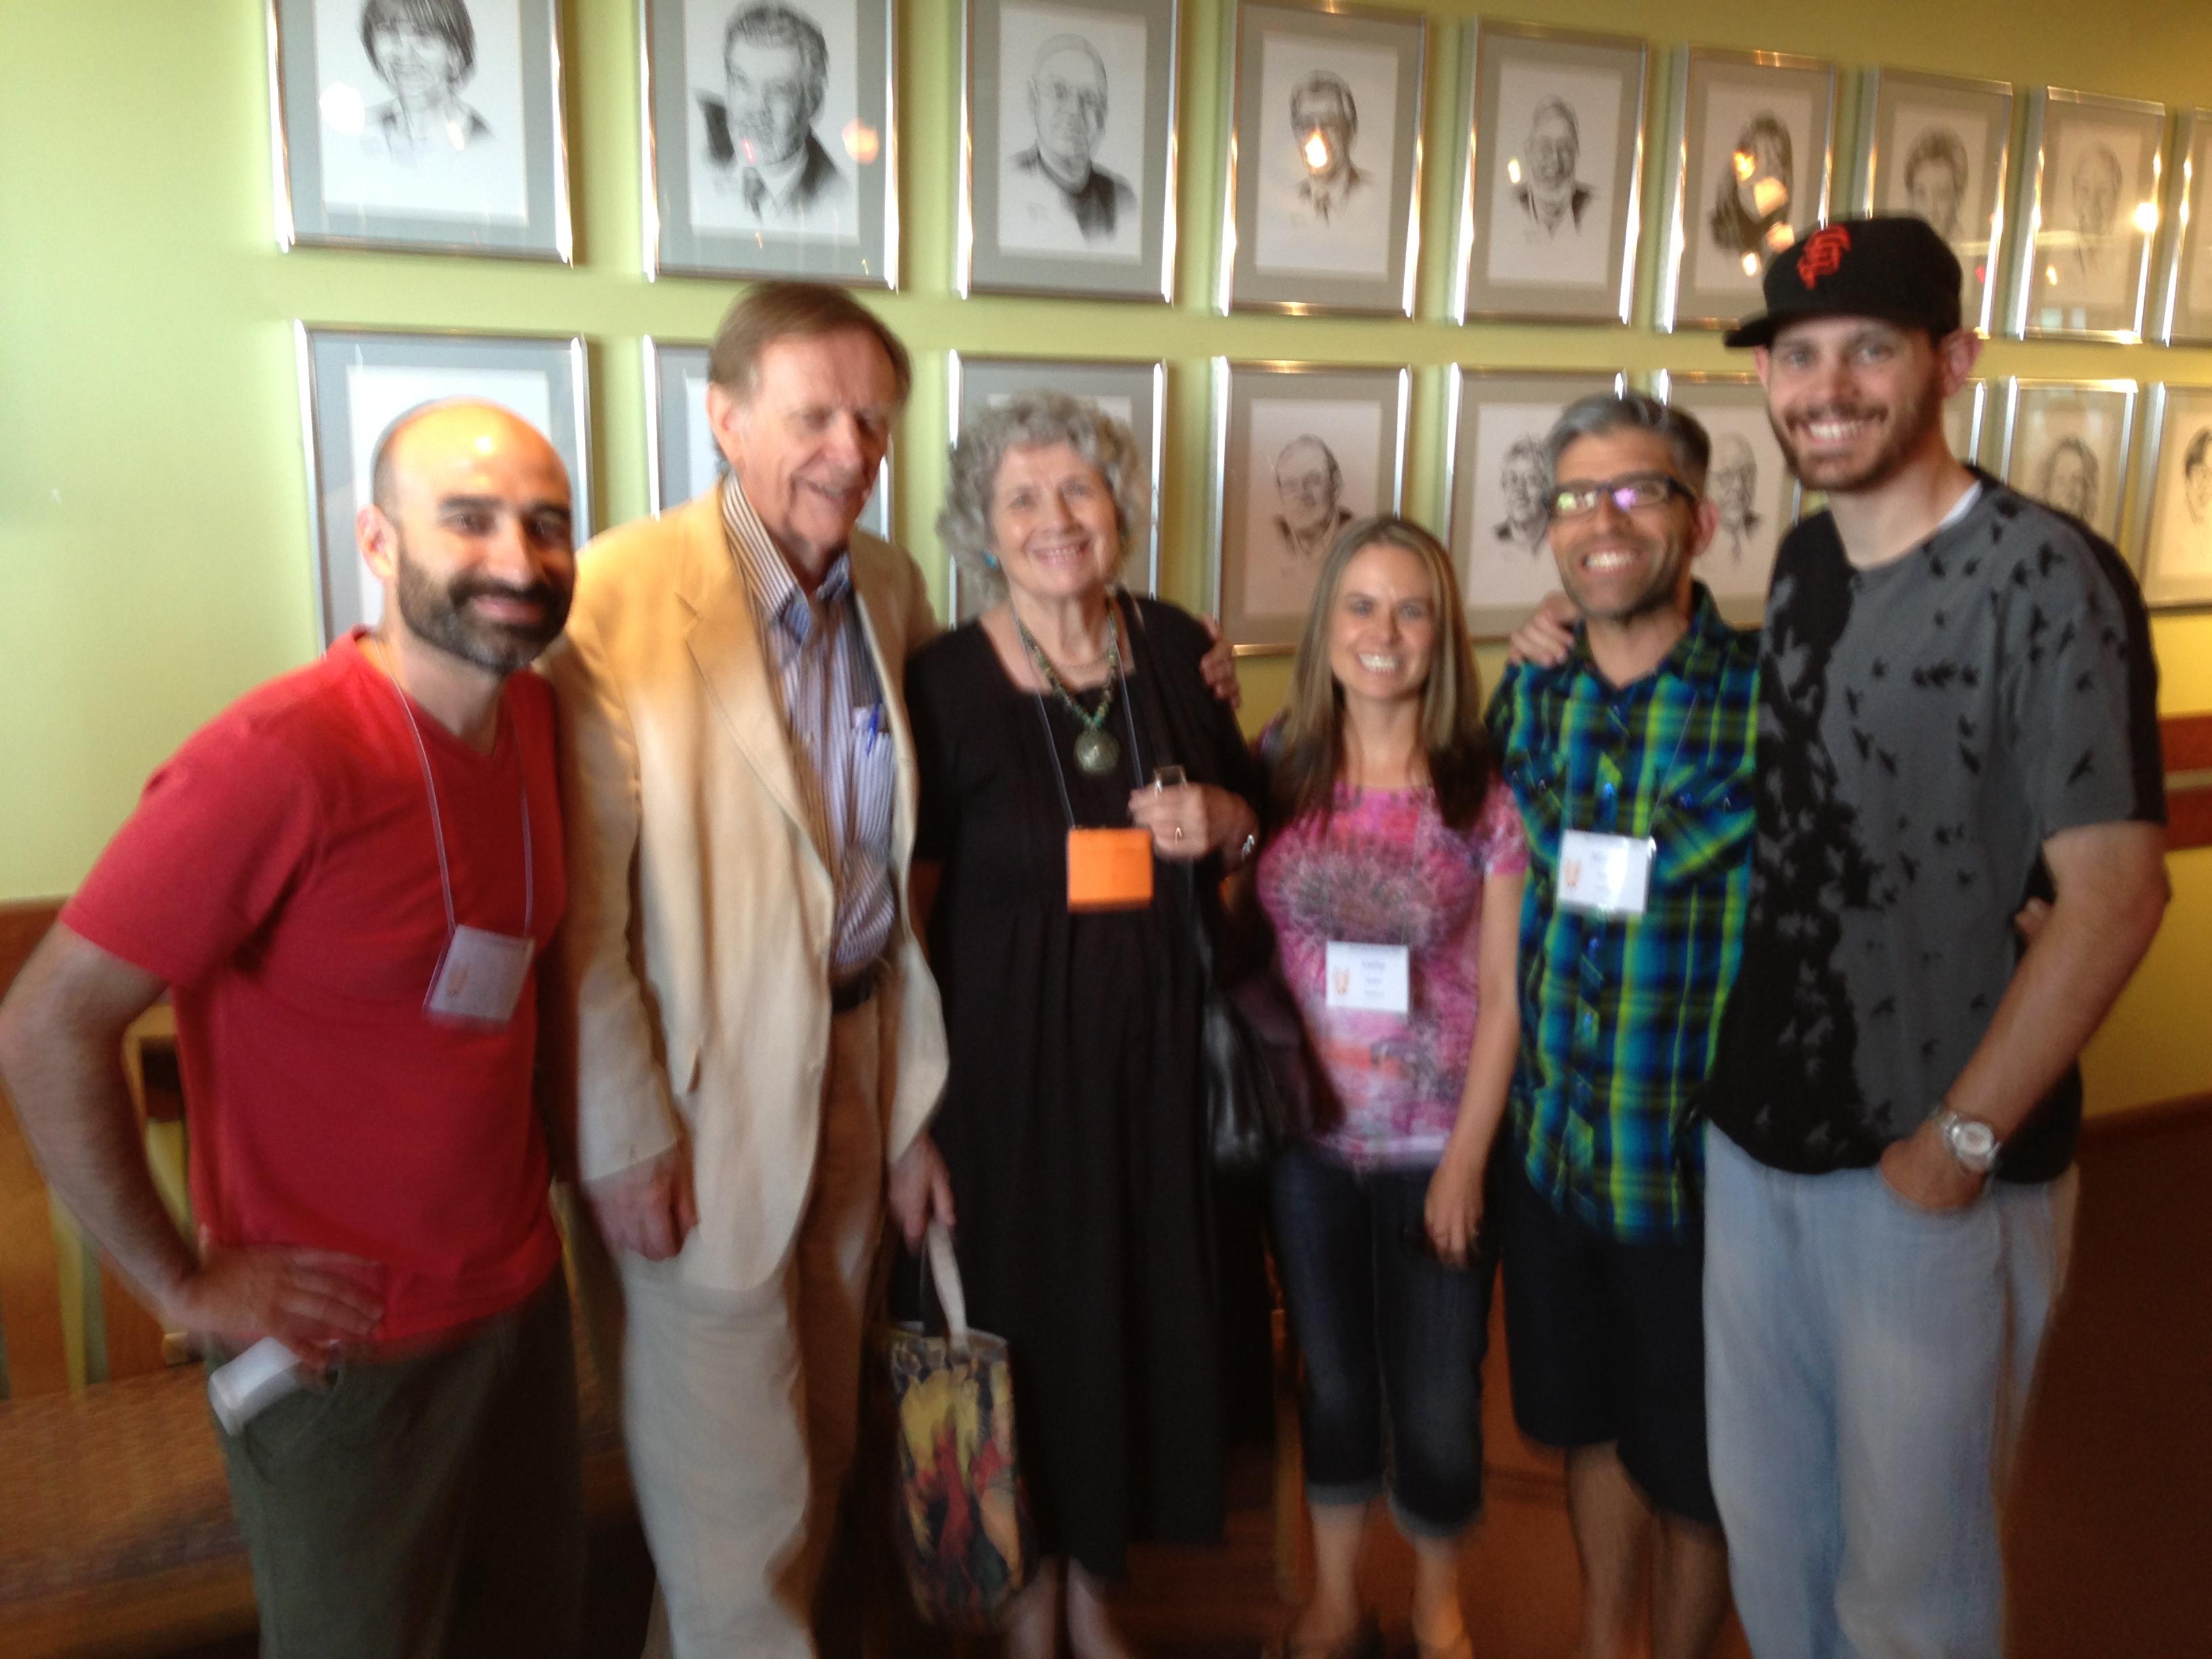 Sunstone Symposium 2013: A Photo Journal